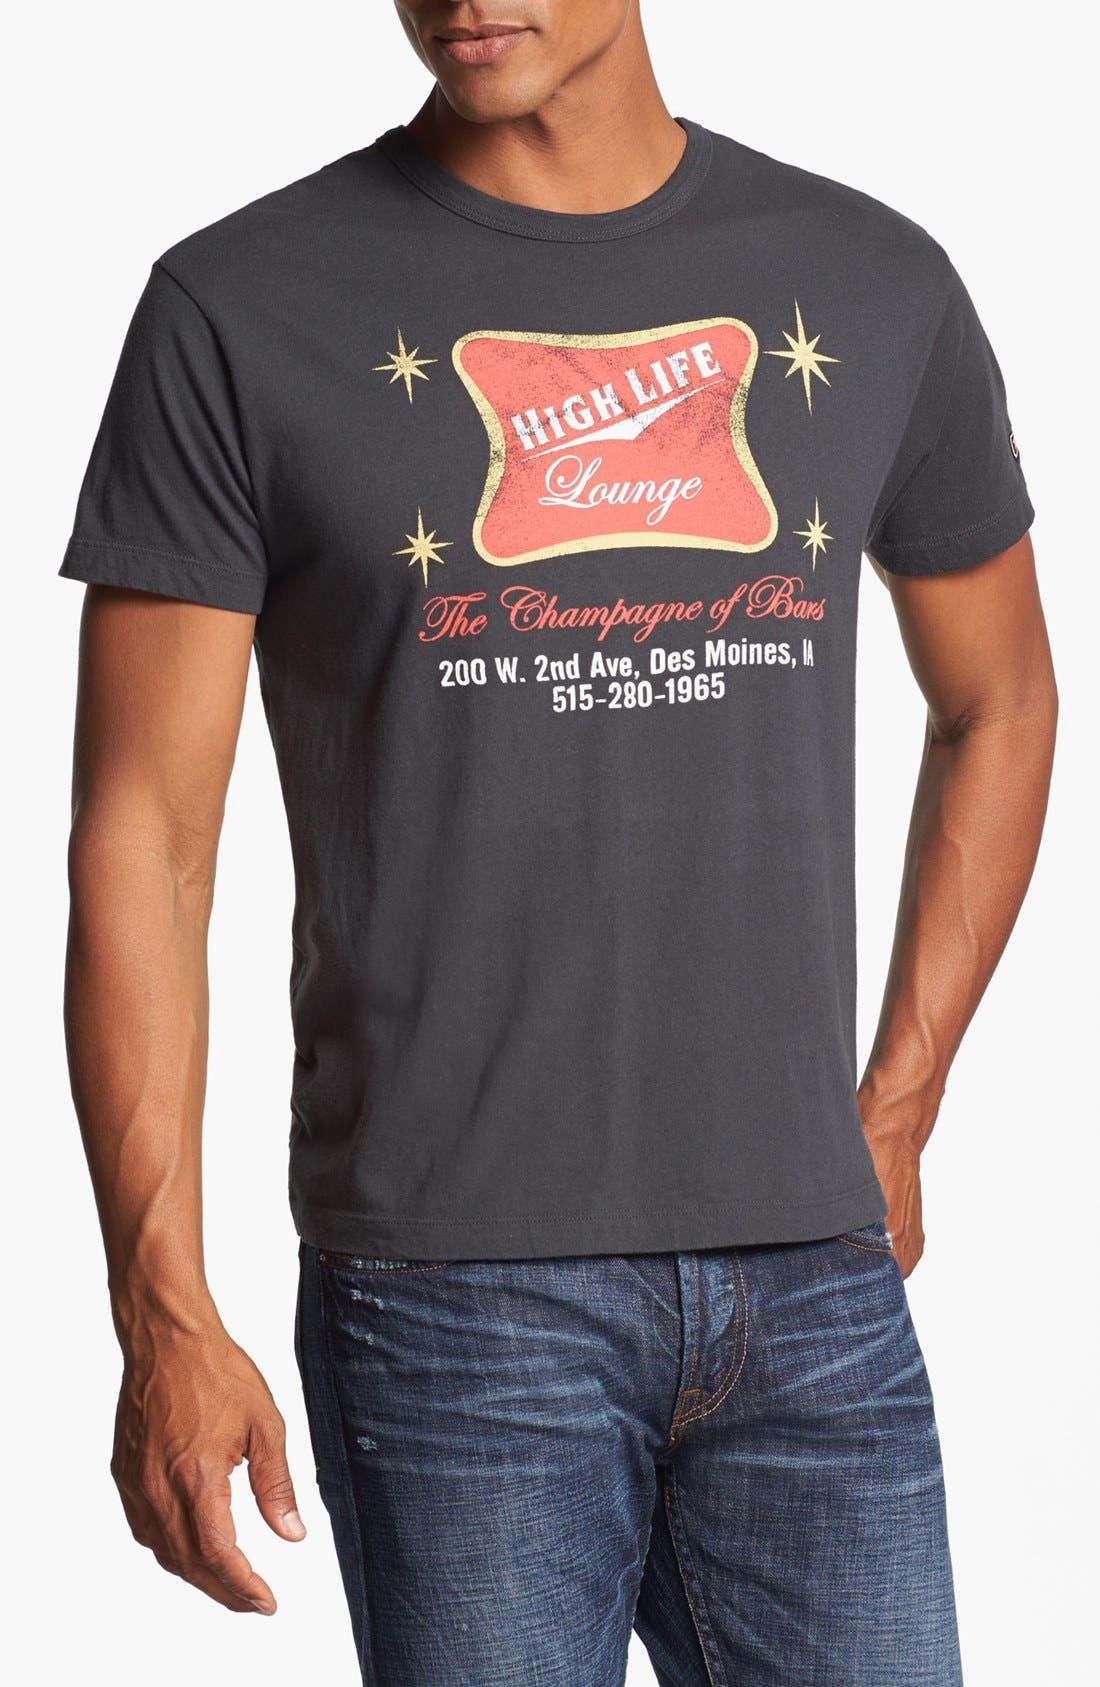 Main Image - Tailgate 'High Life Lounge' Trim Fit T-Shirt